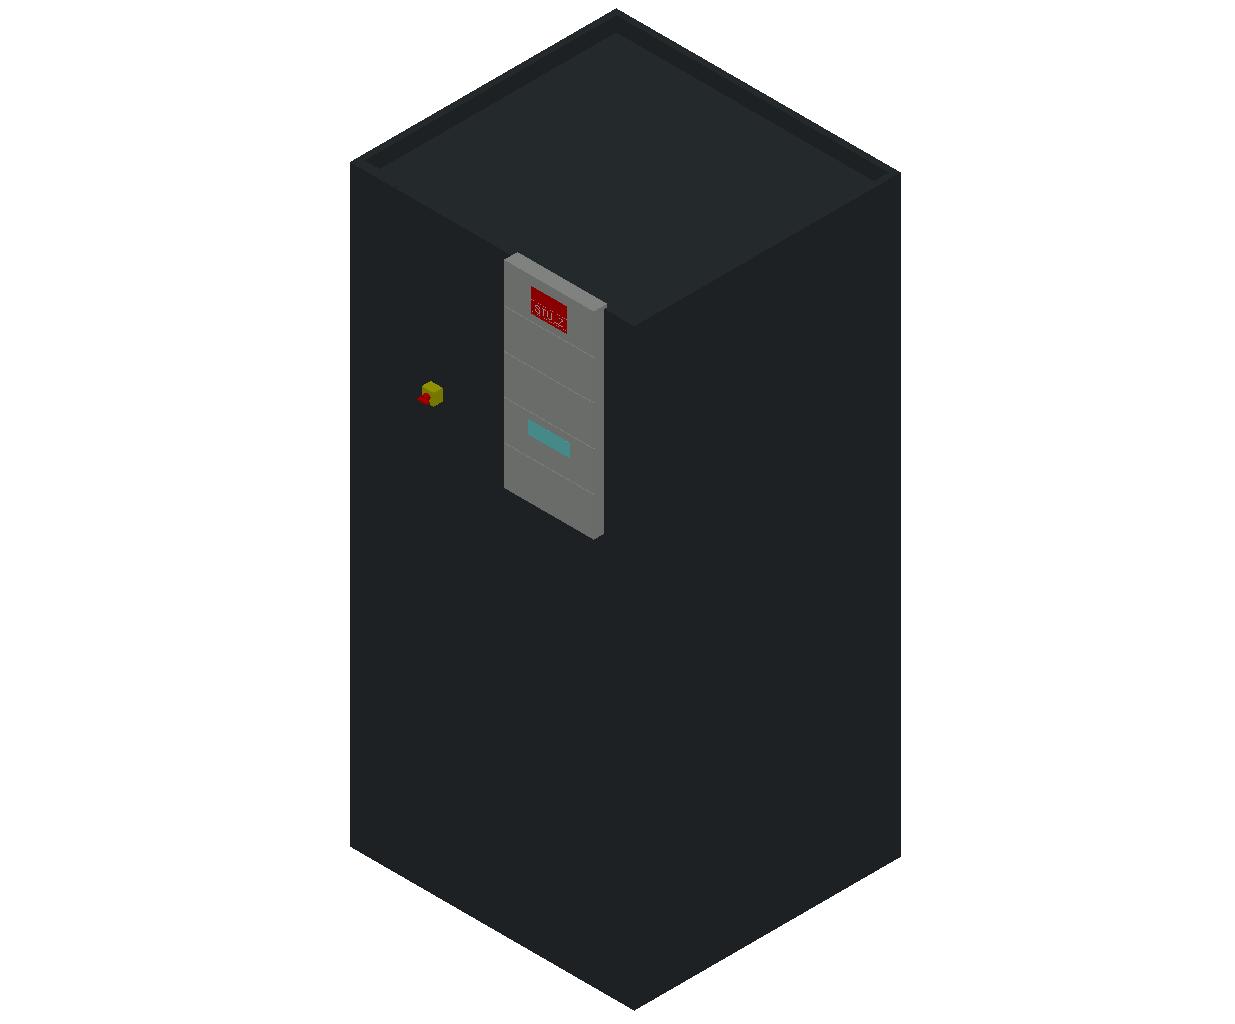 HC_Air Conditioner_Indoor Unit_MEPcontent_STULZ_CyberAir 3PRO_ASD-ALD_Single Circuit GE_ALD_361_GE_INT-EN.dwg